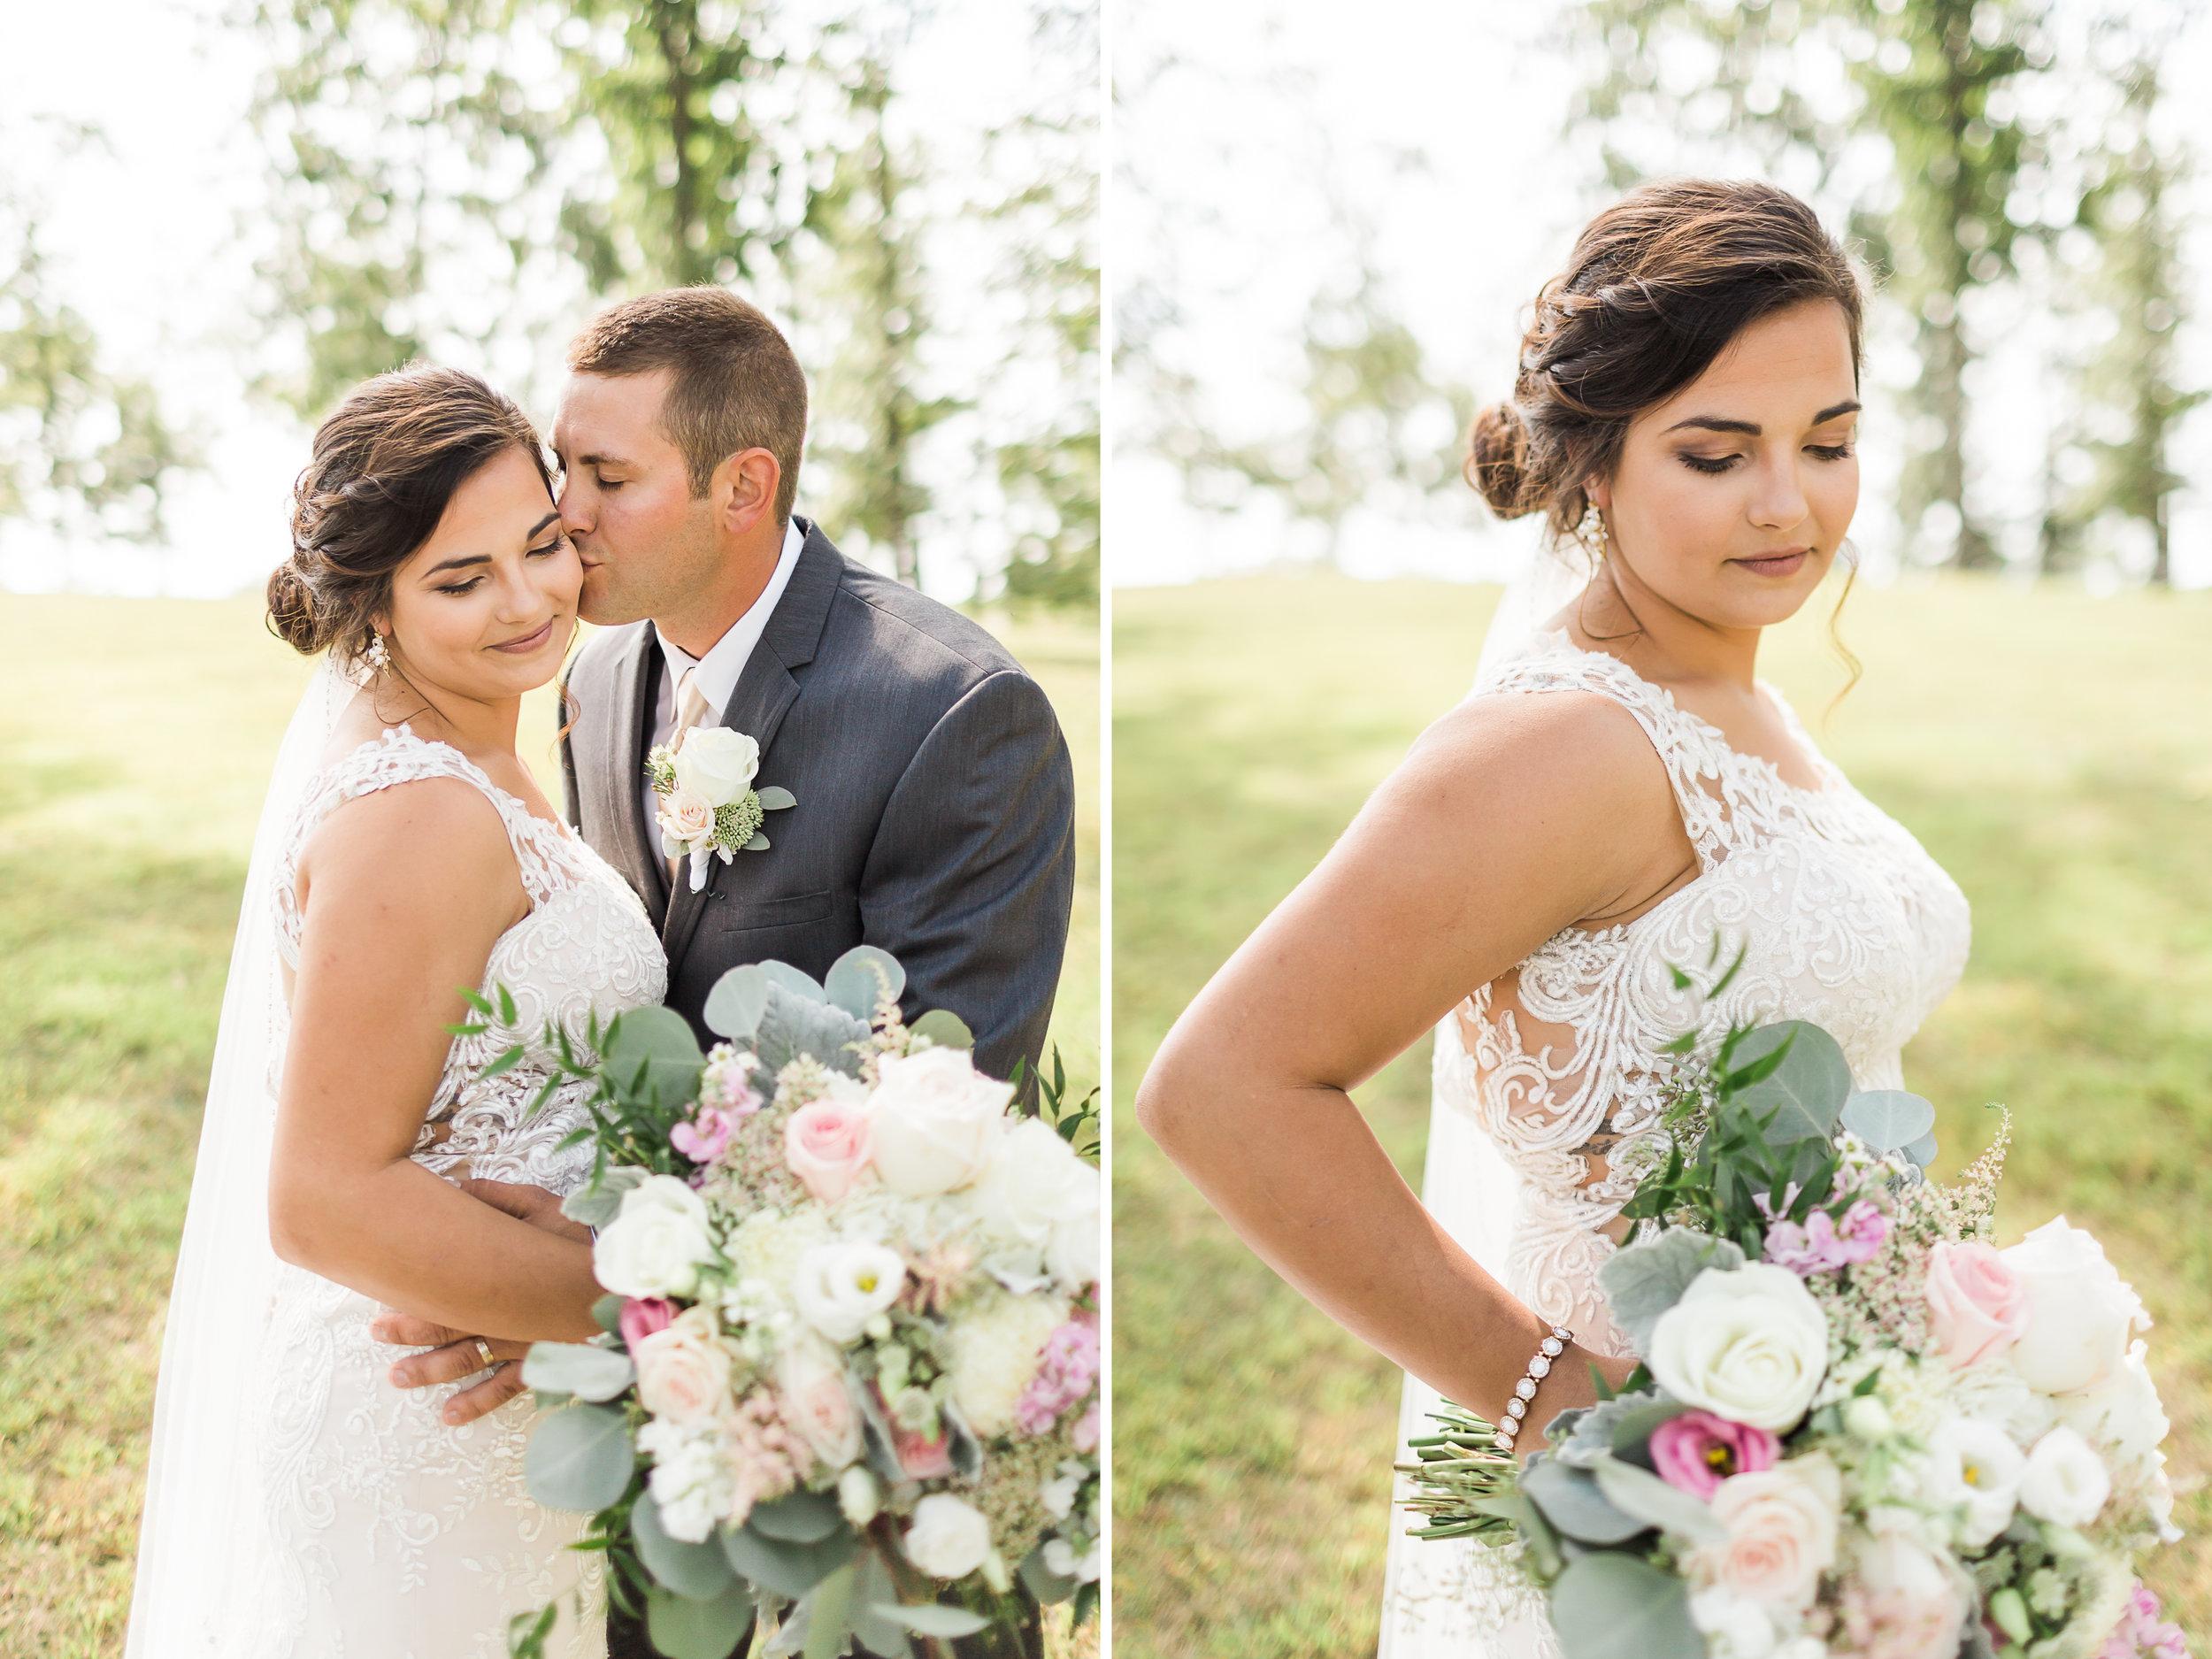 romanticcountrywedding-10.jpg